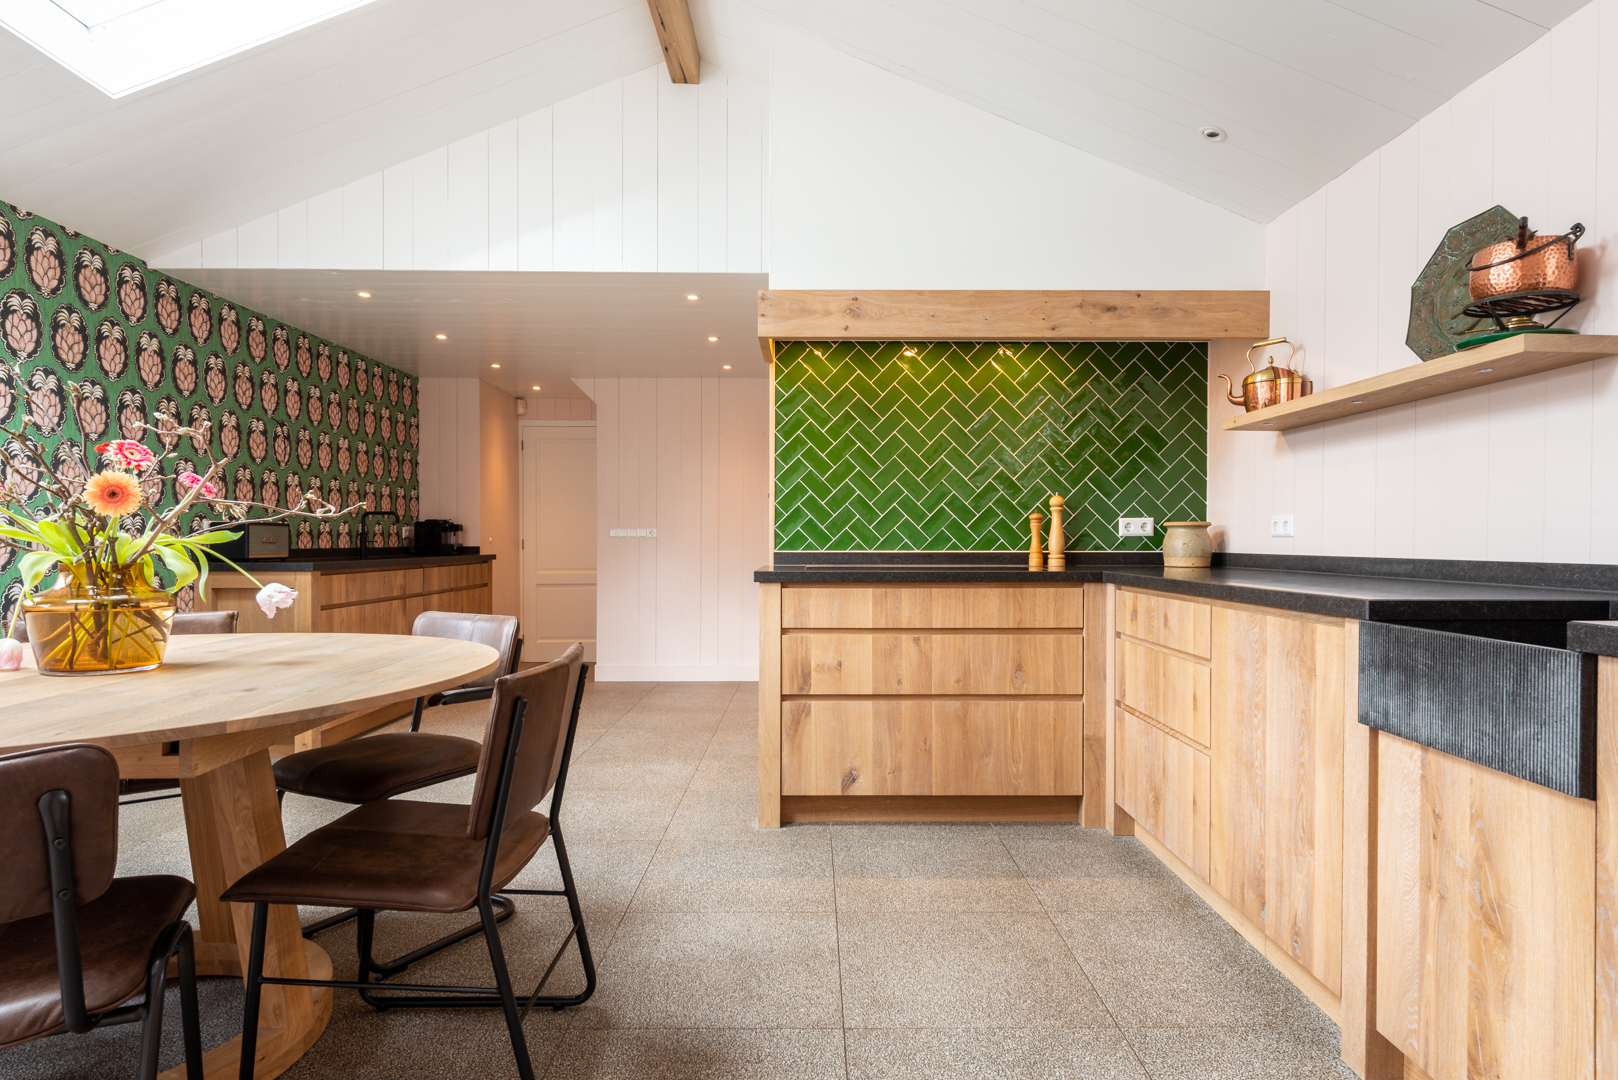 Greeploze sfeervolle keuken met Miele apparatuur